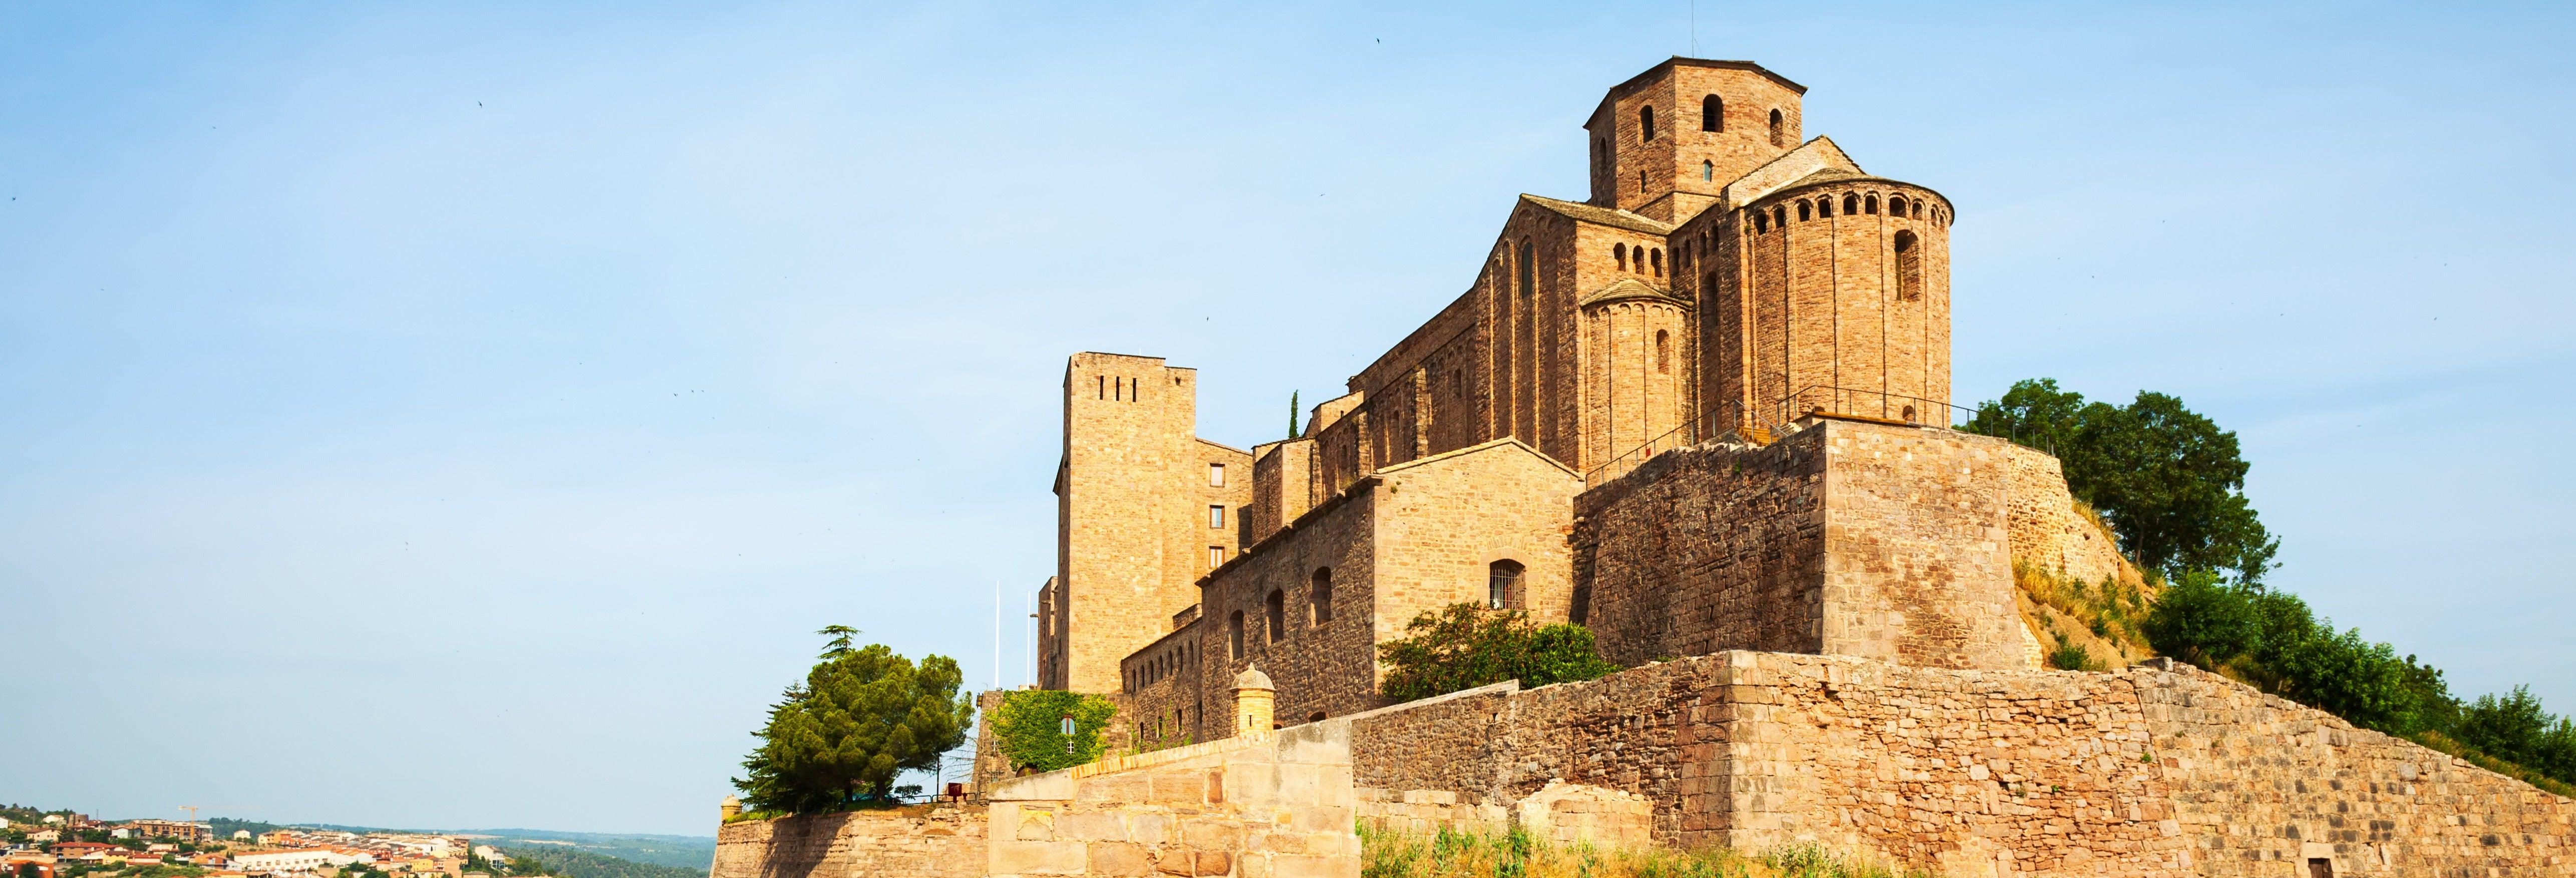 Cardona and Montserrat Trip